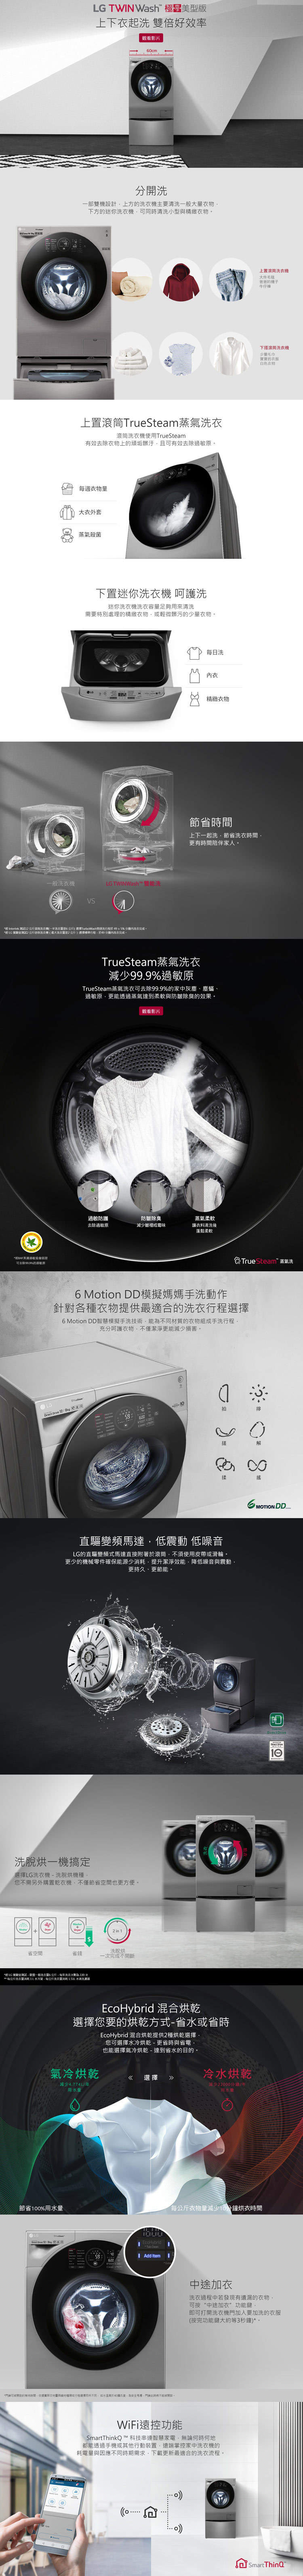 LG 樂金 WD-S12GV 洗衣機 12kg 6 MOTION DD智慧模擬手洗